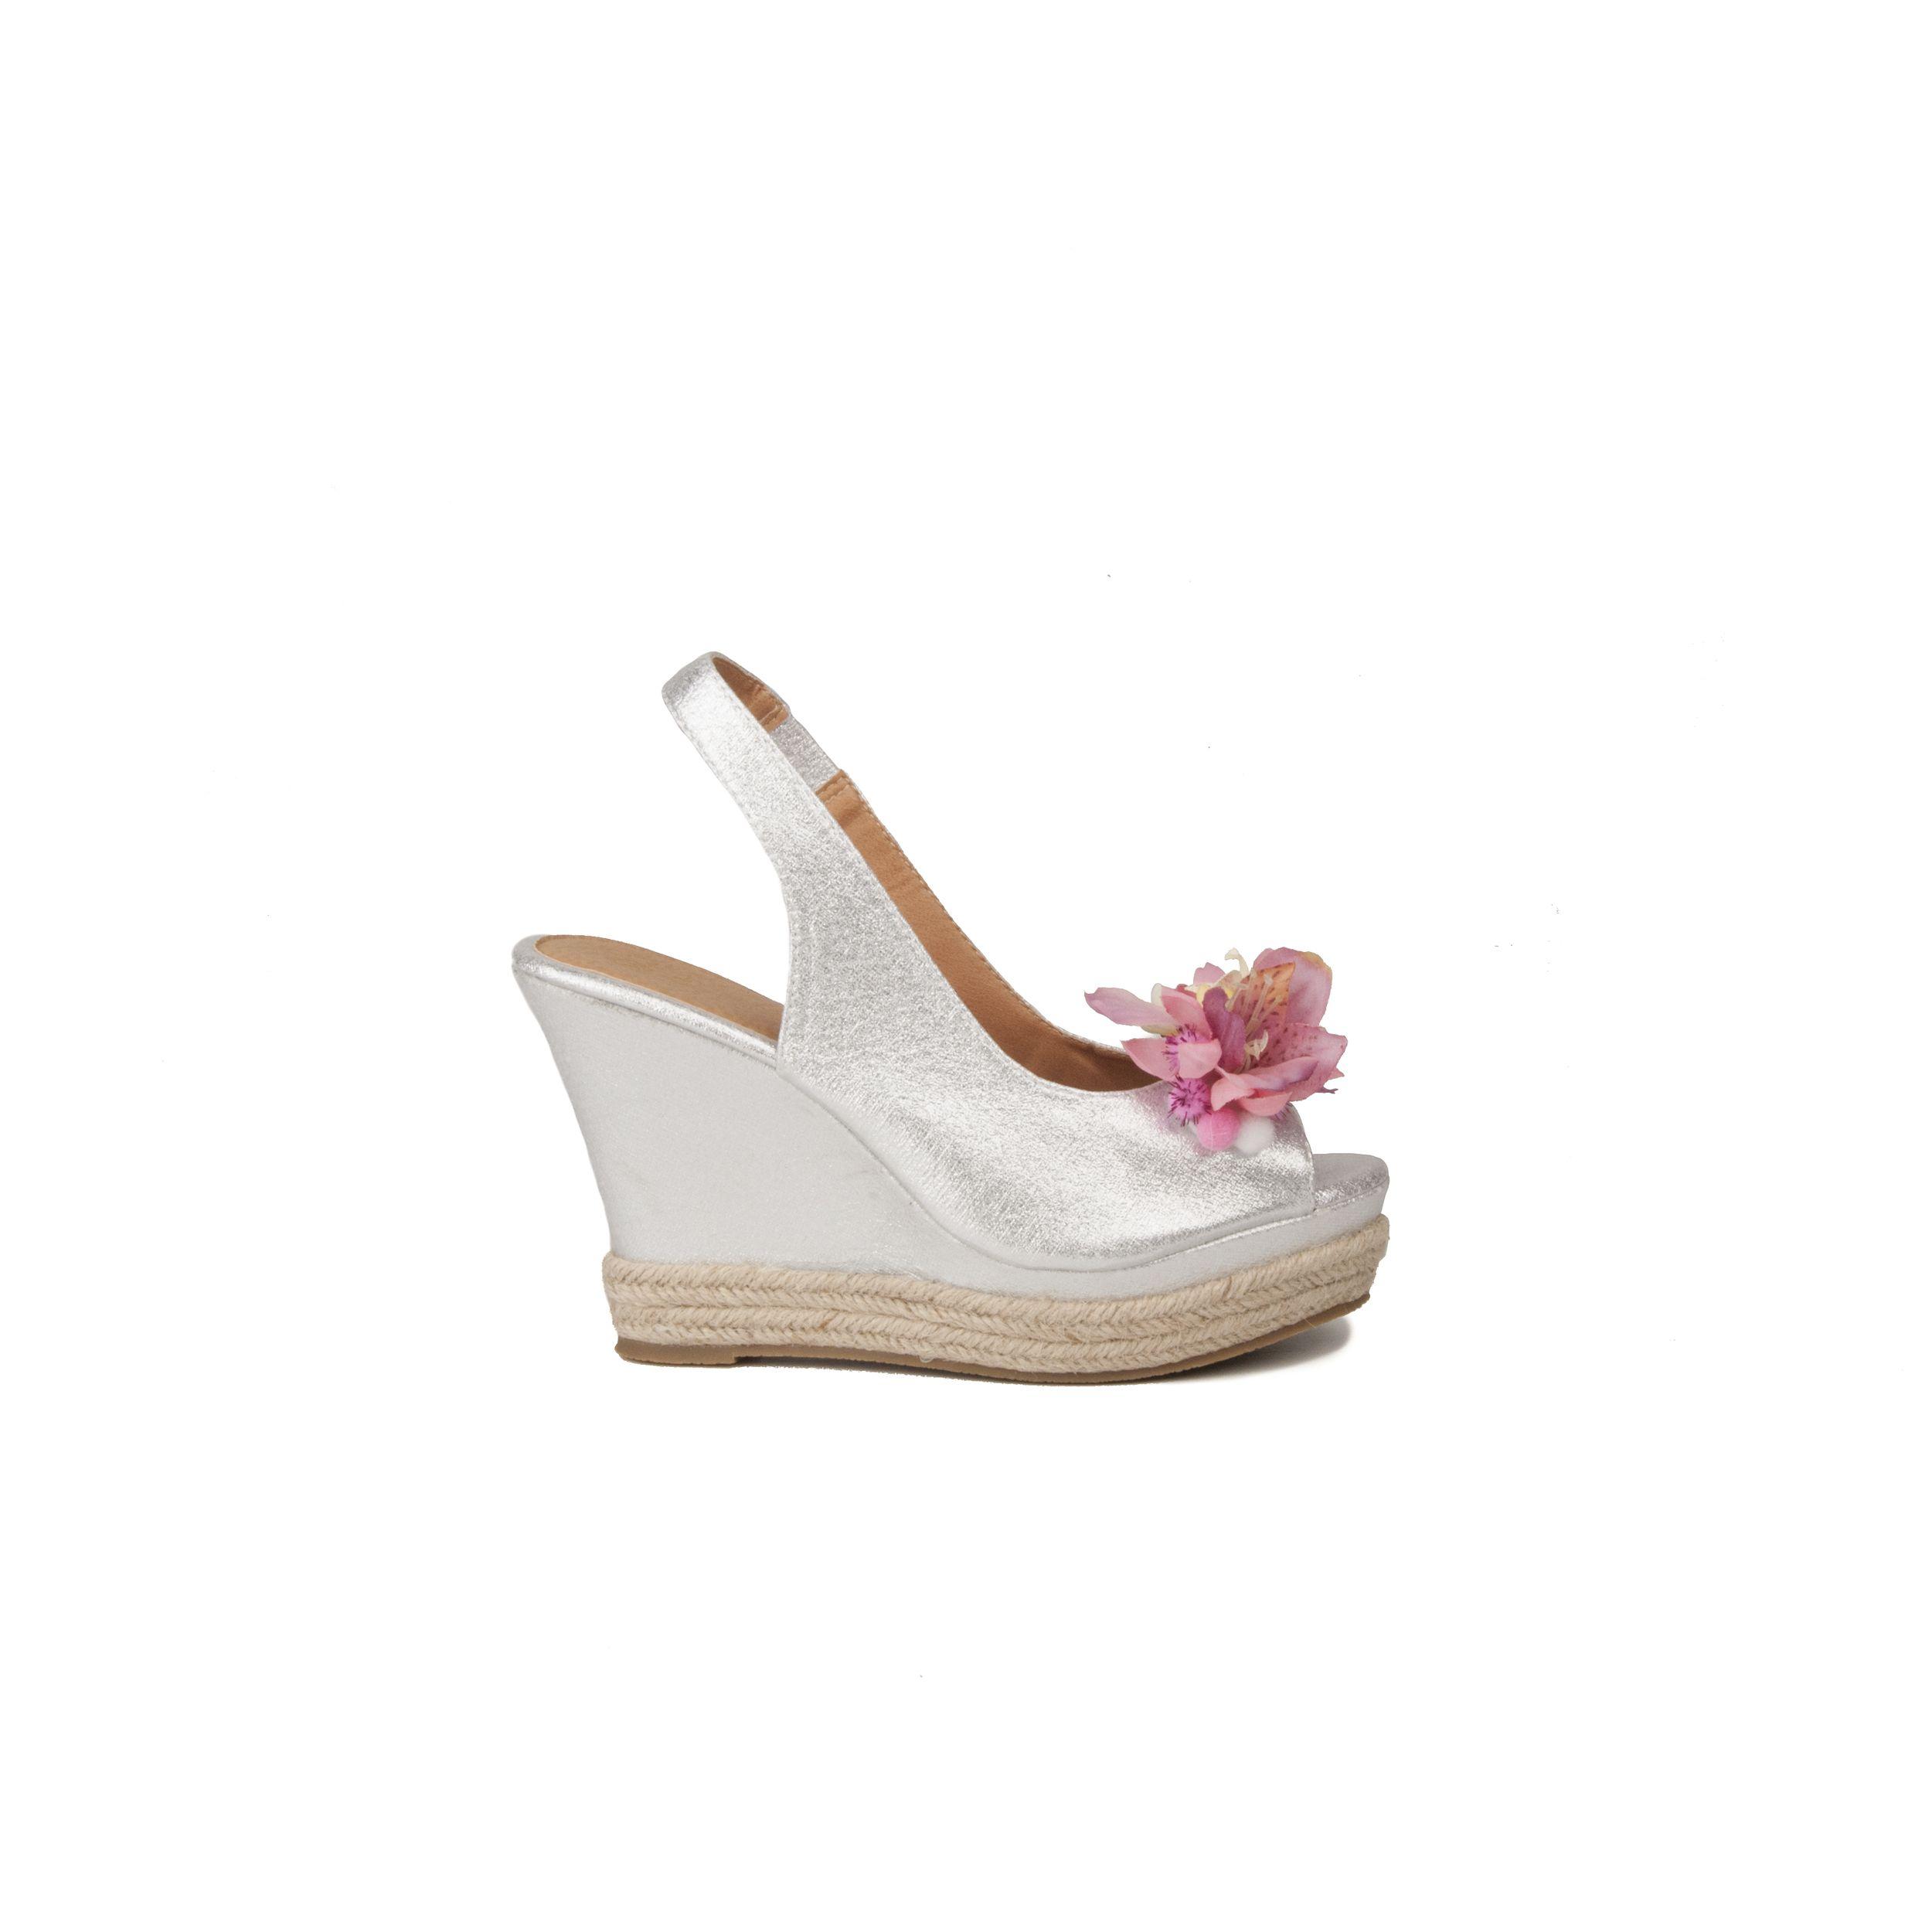 Maria Graor Wedge Sandal in Silver